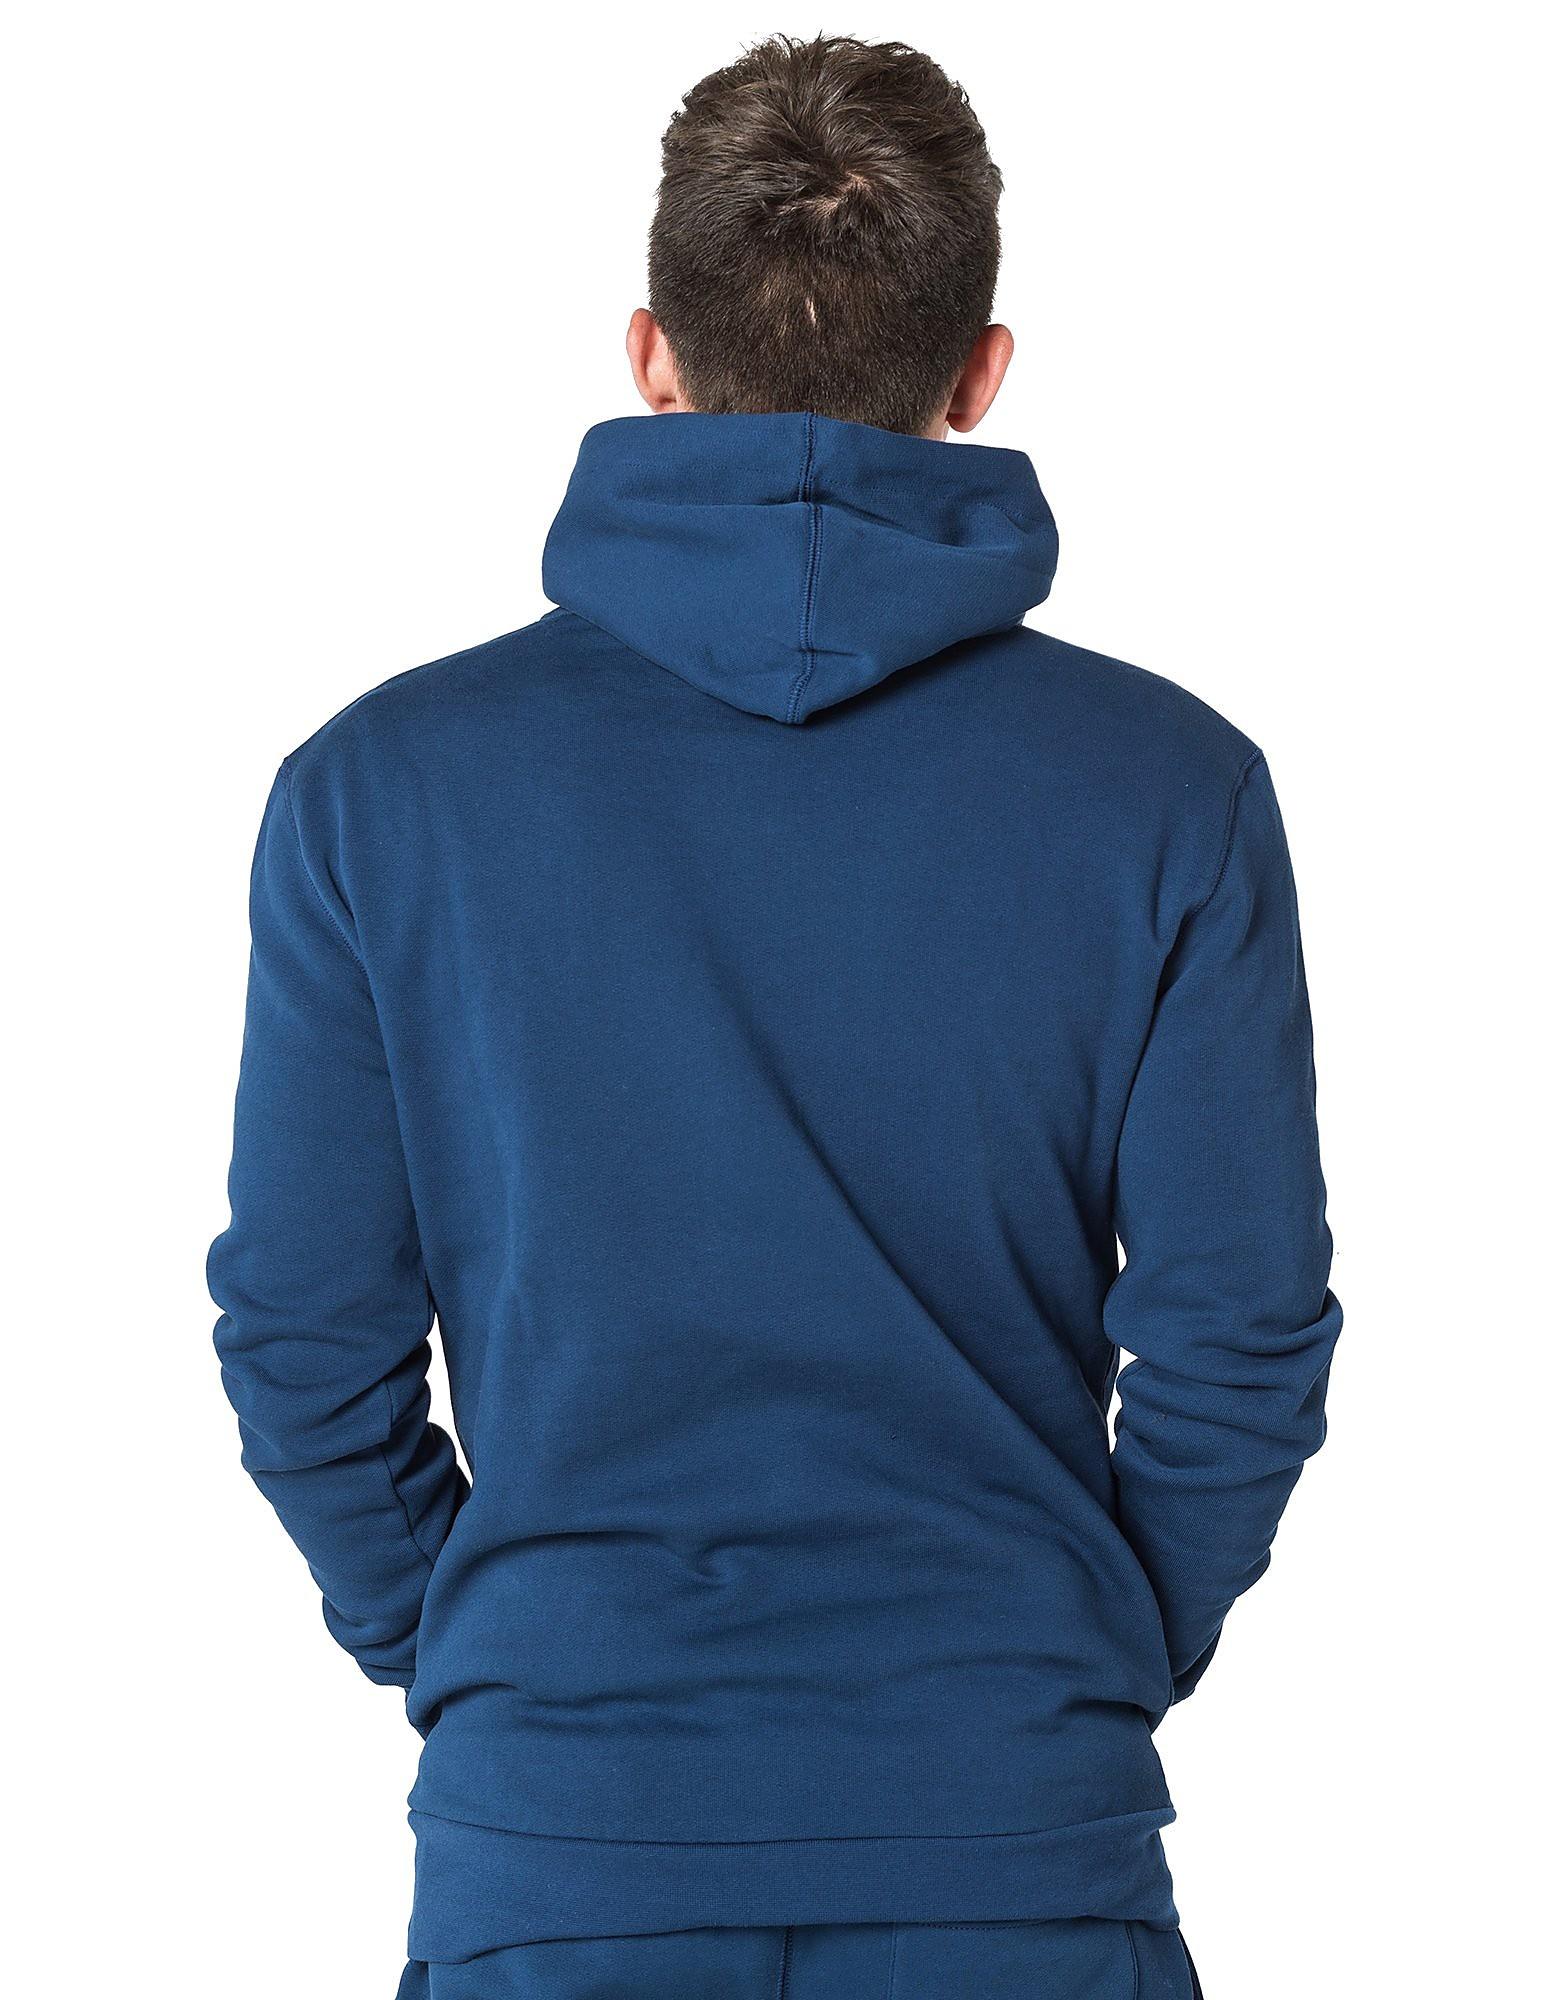 11 Degrees Core Fleece Overhead Hoodie